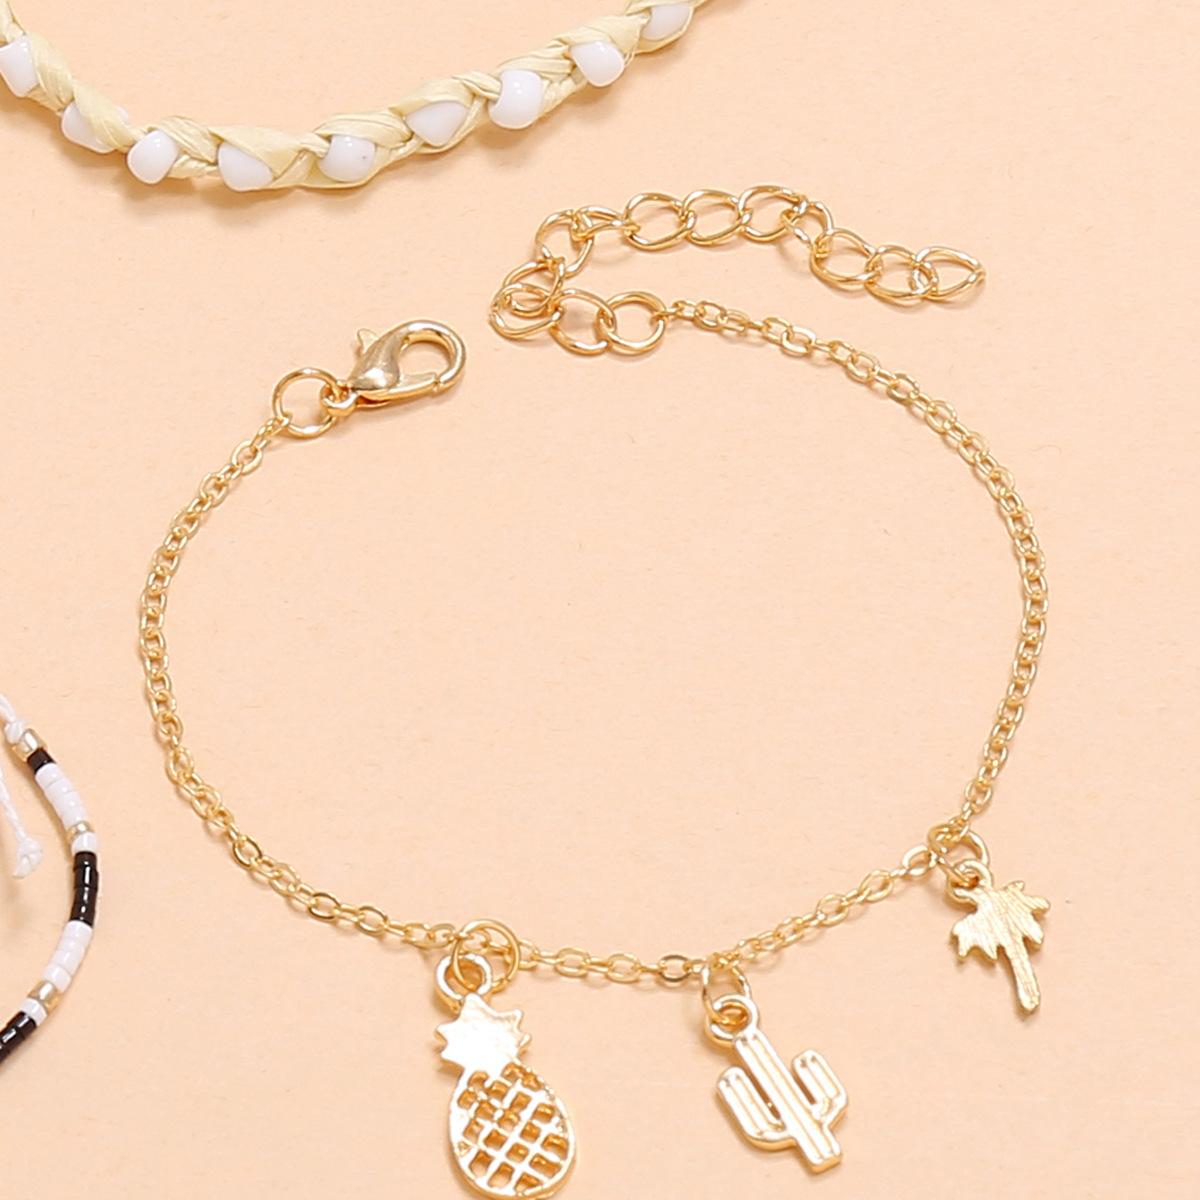 Fashion handwoven beaded cactus pineapple coconut tree hollow shell bracelet 4 piece set NHPV243685